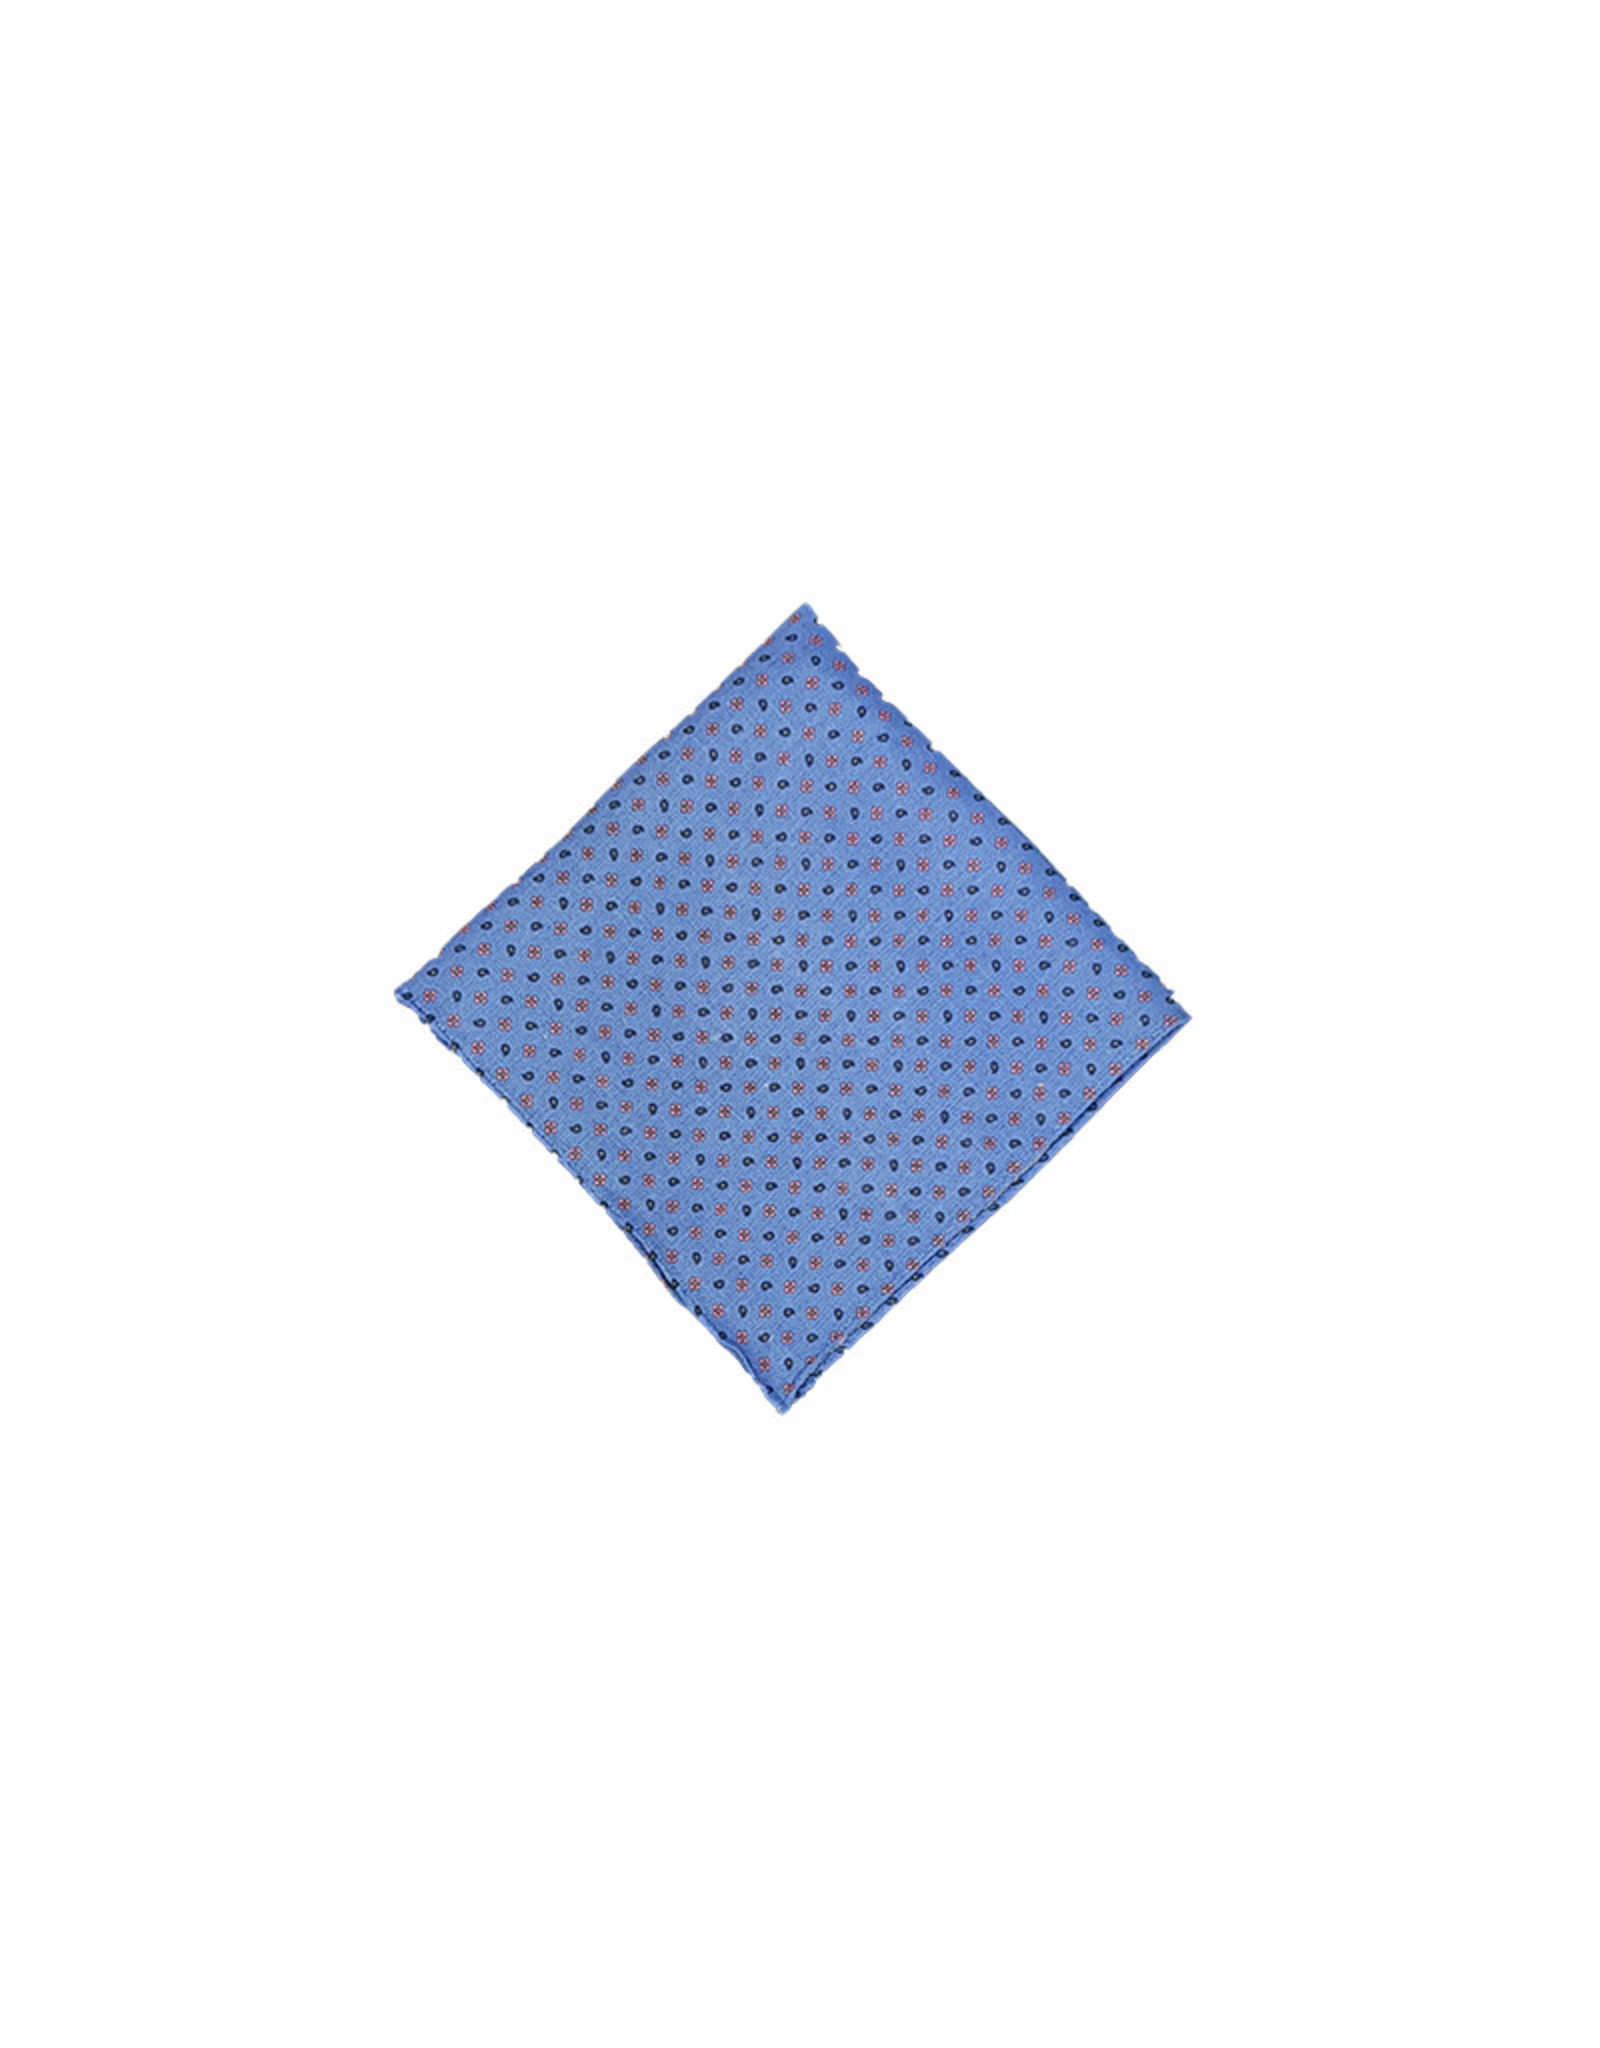 Anthime Mouley Sandmore's pochet blauw bloemetjes 7401/1